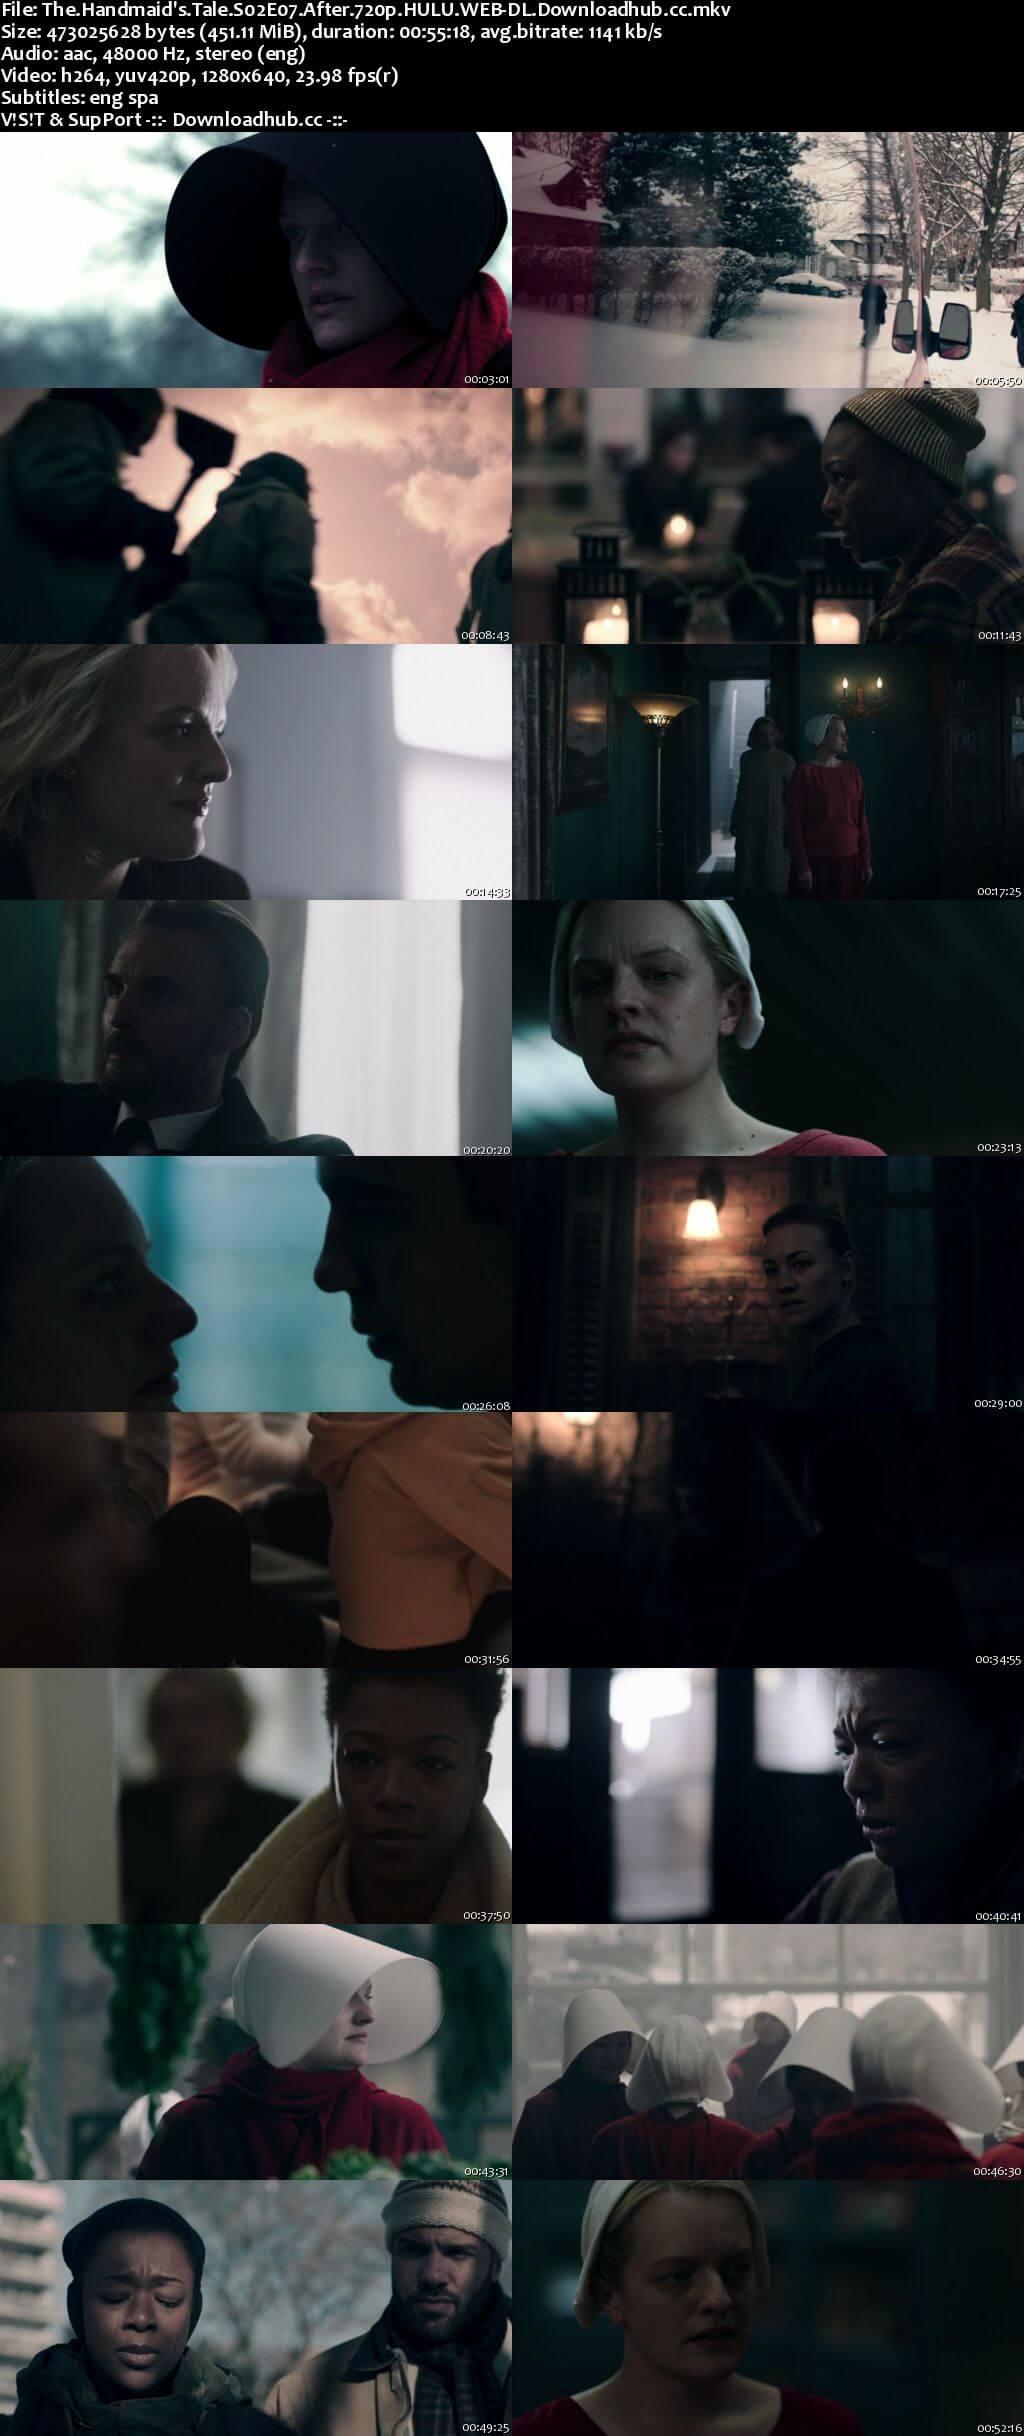 The Handmaids Tale S02E07 450MB HULU WEB-DL 720p x264 ESubs